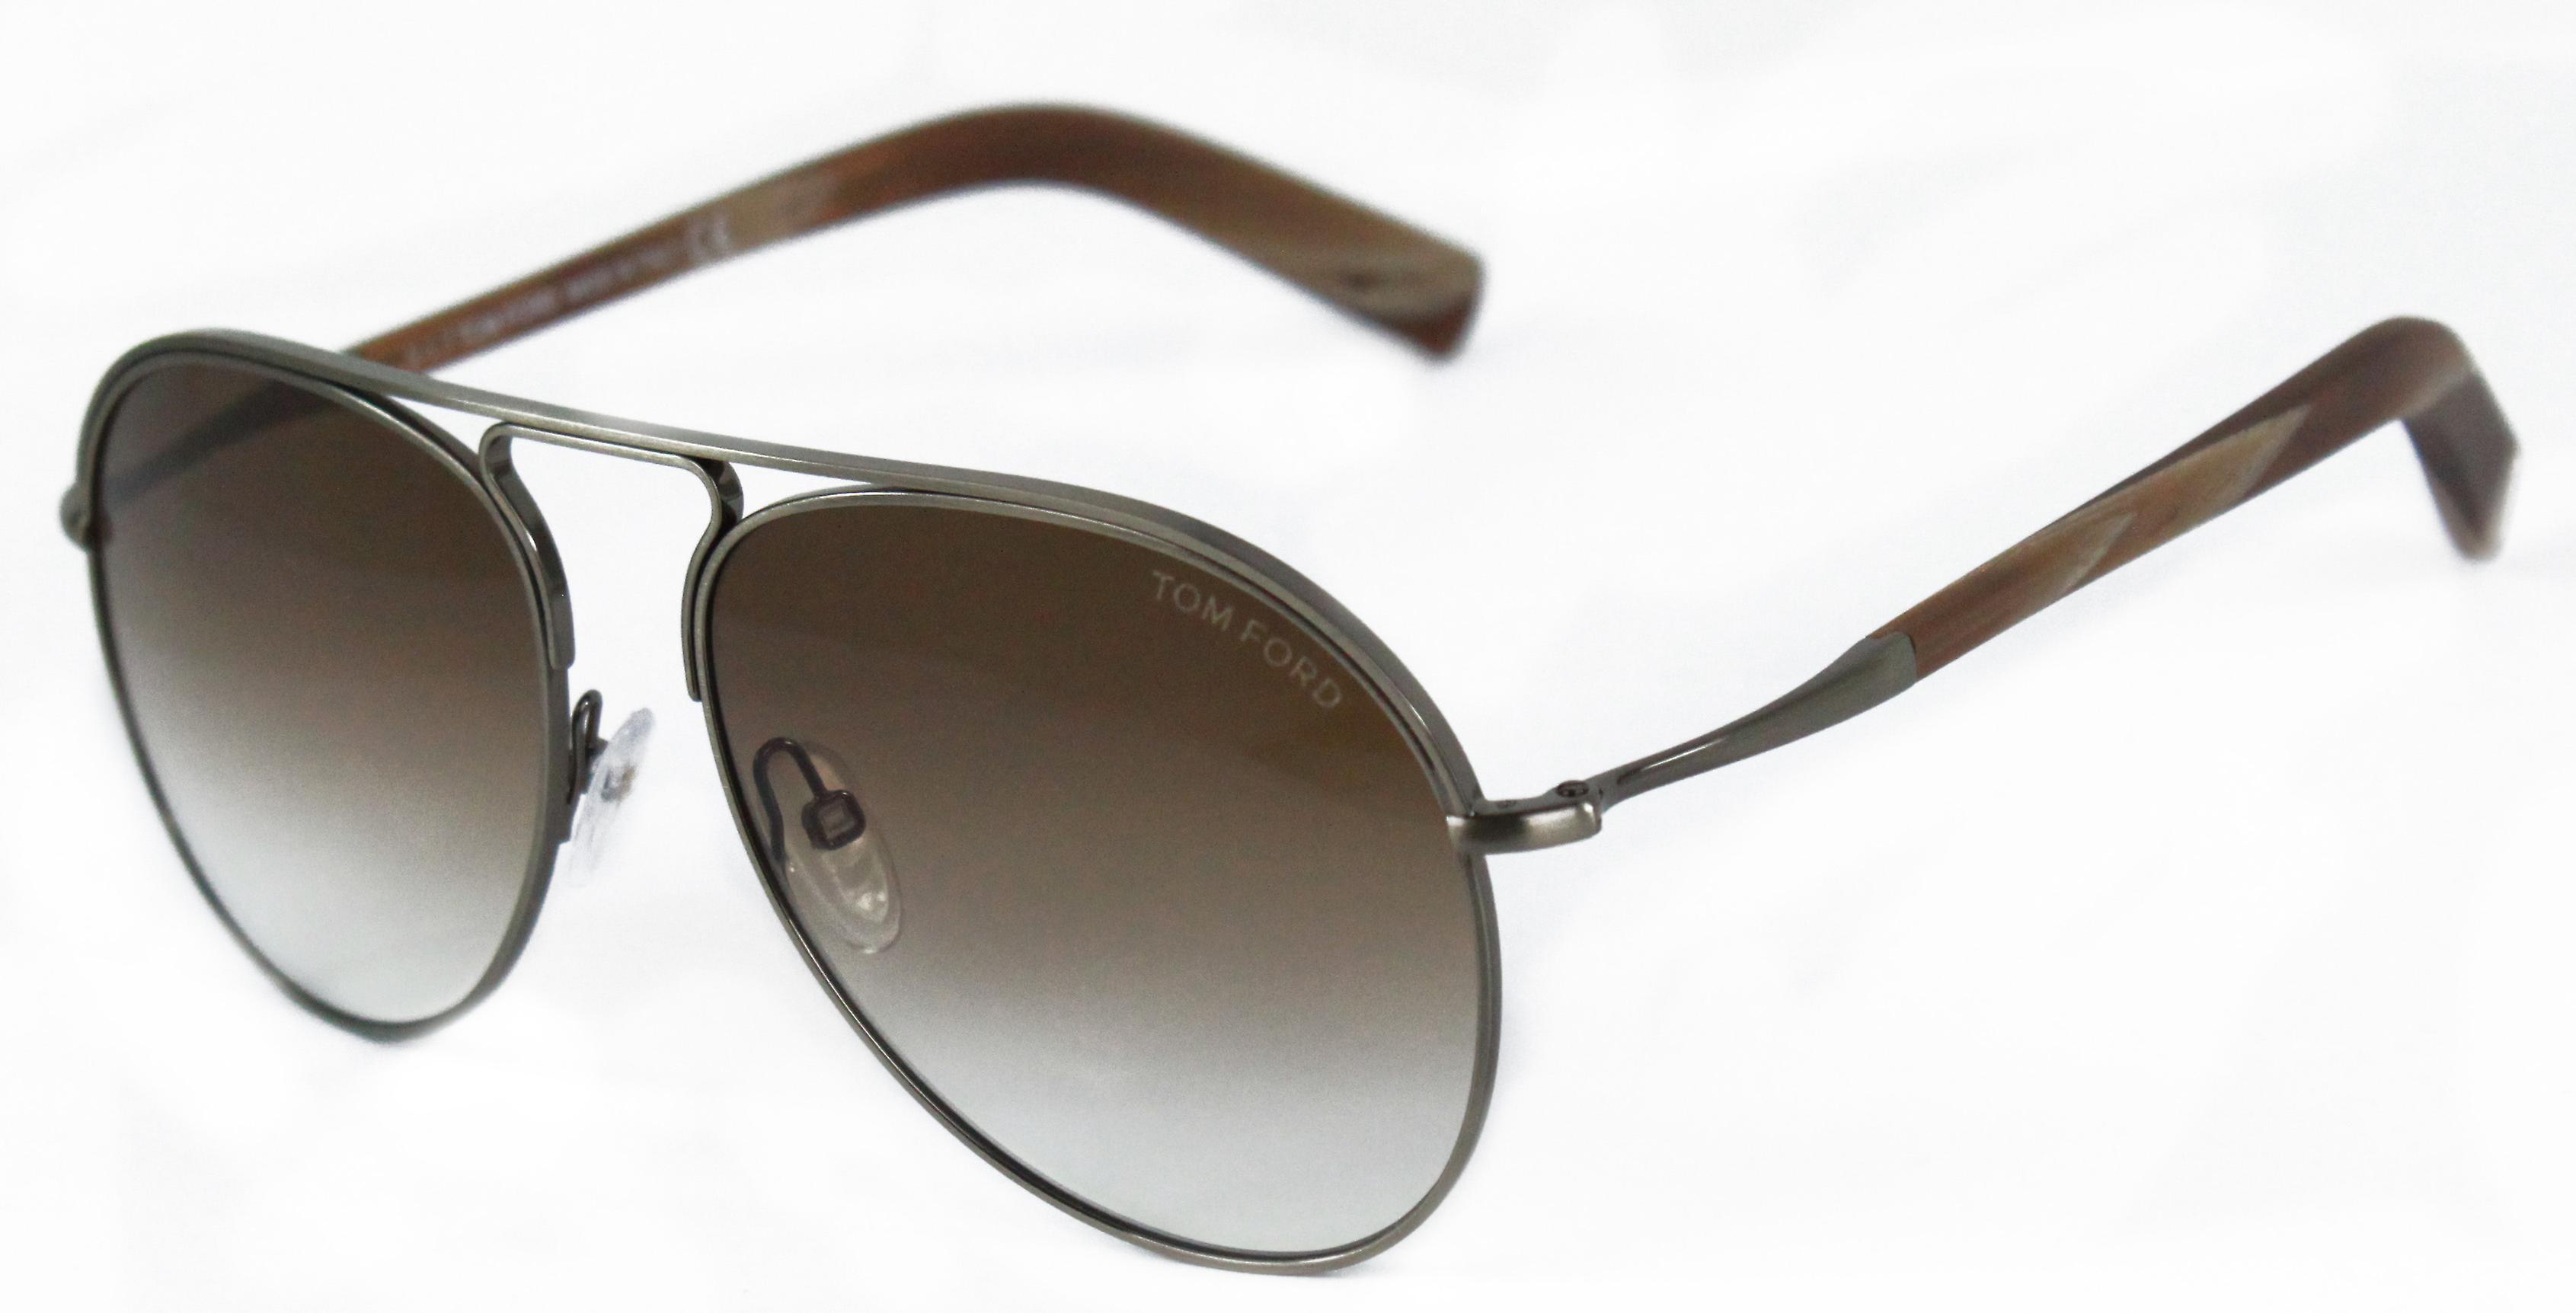 e1de107f0 توم فورد FT0448 كودي النظارات الشمسية 33F | Fruugo